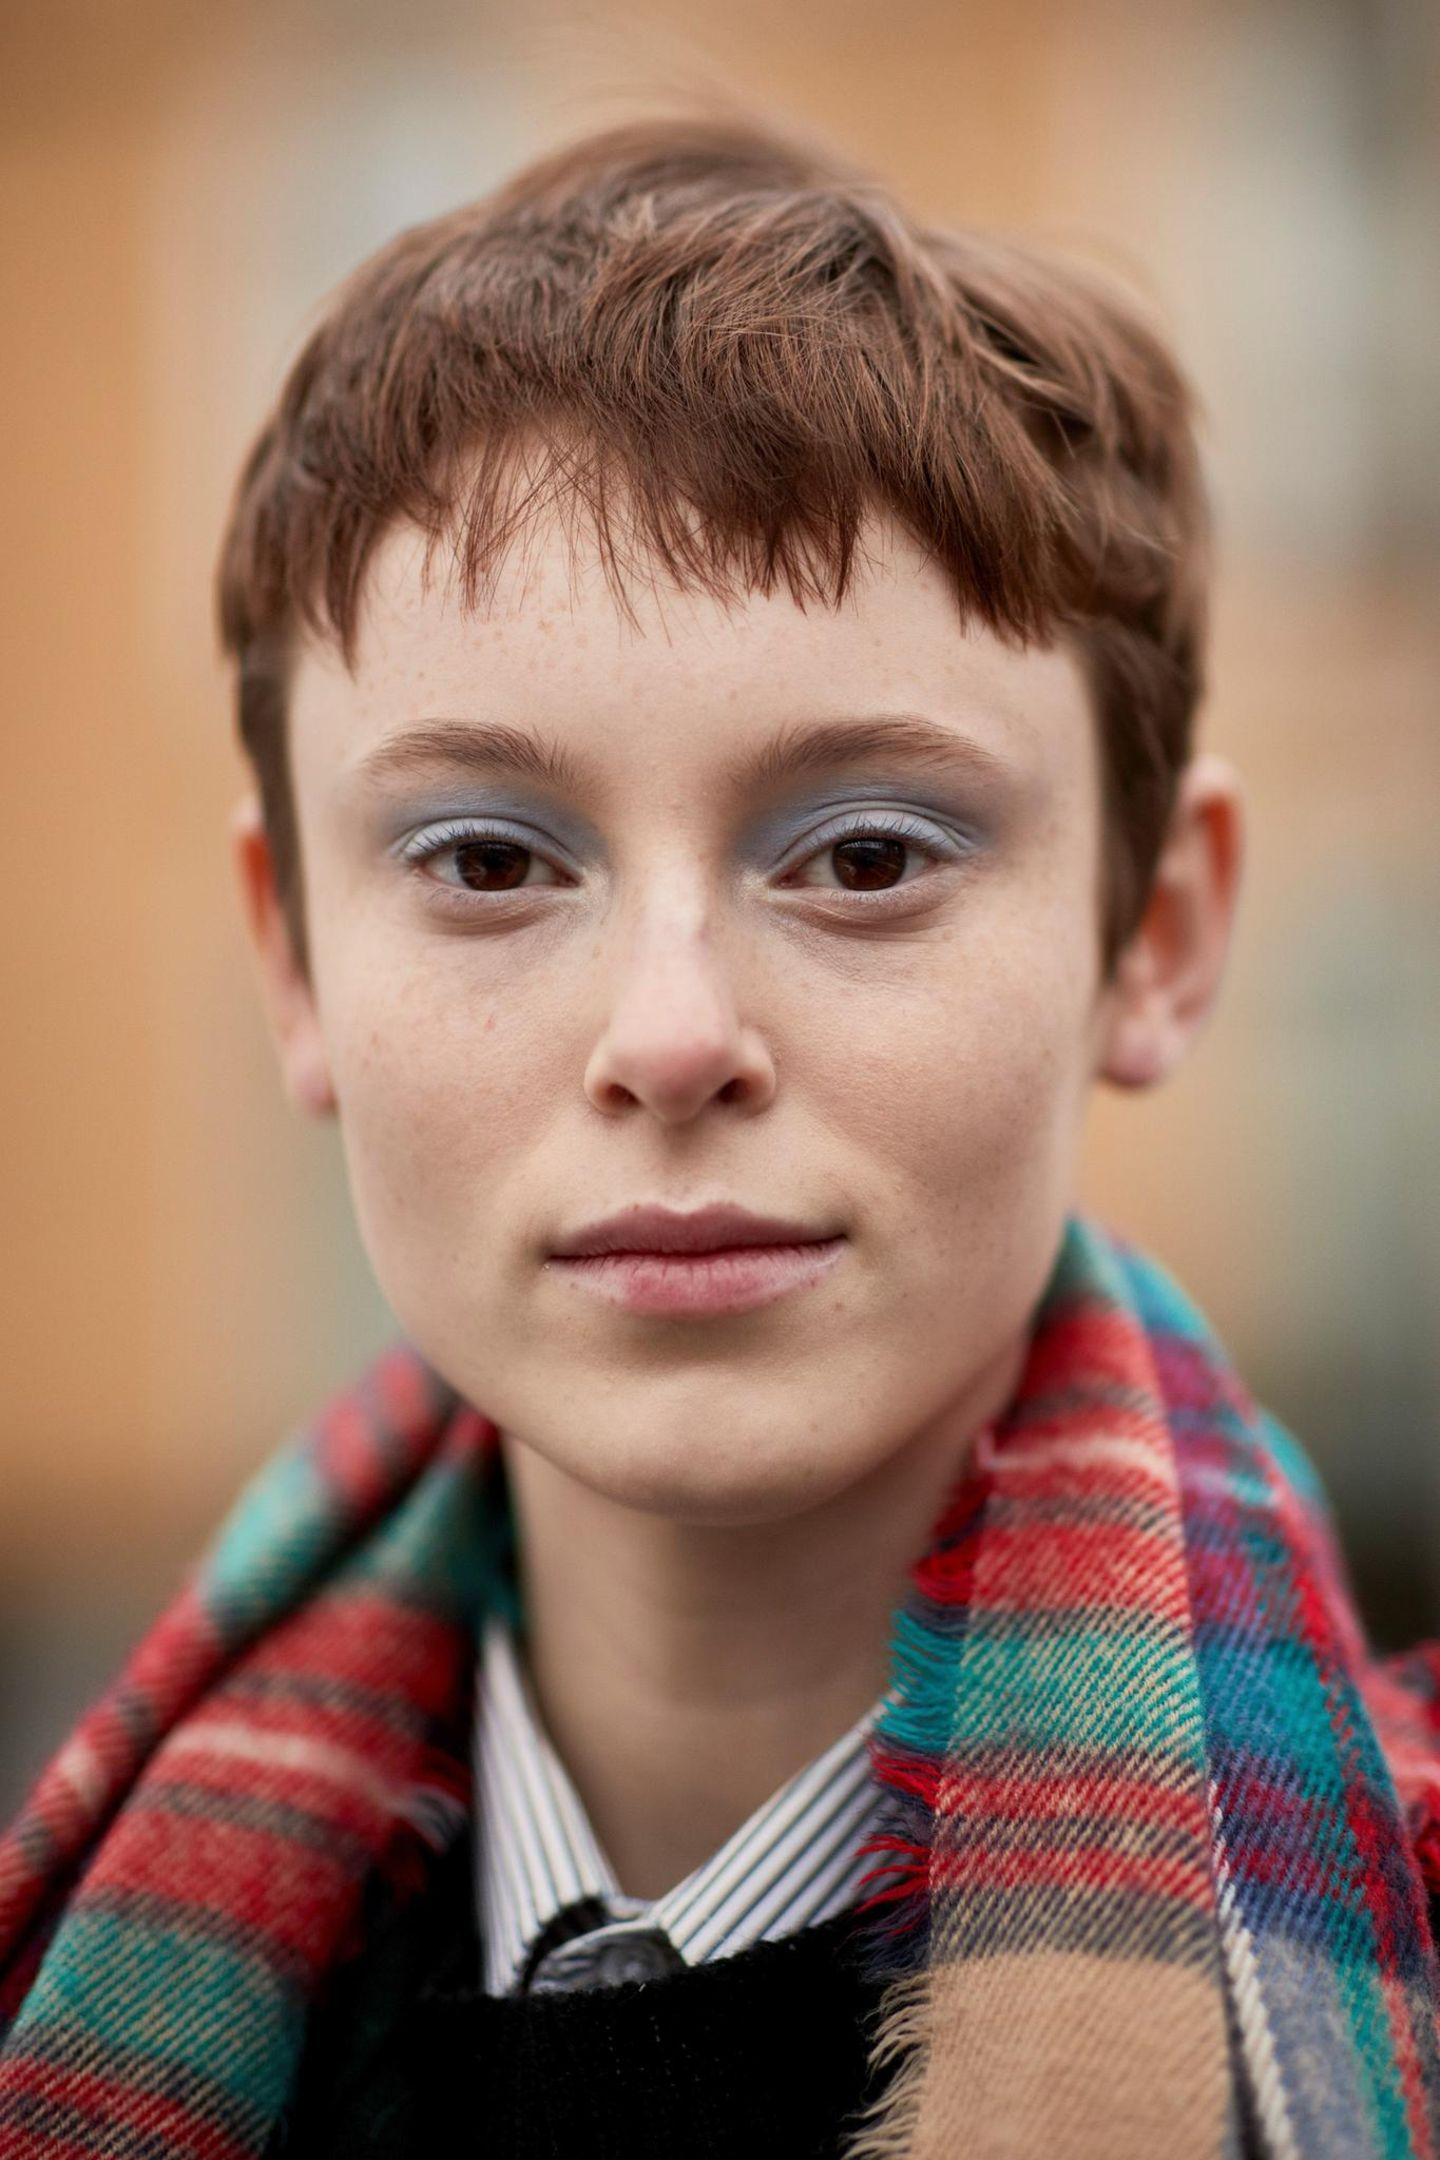 Kurzhaarfrisuren: Pixie Cut mit kastanienbraunen Haaren